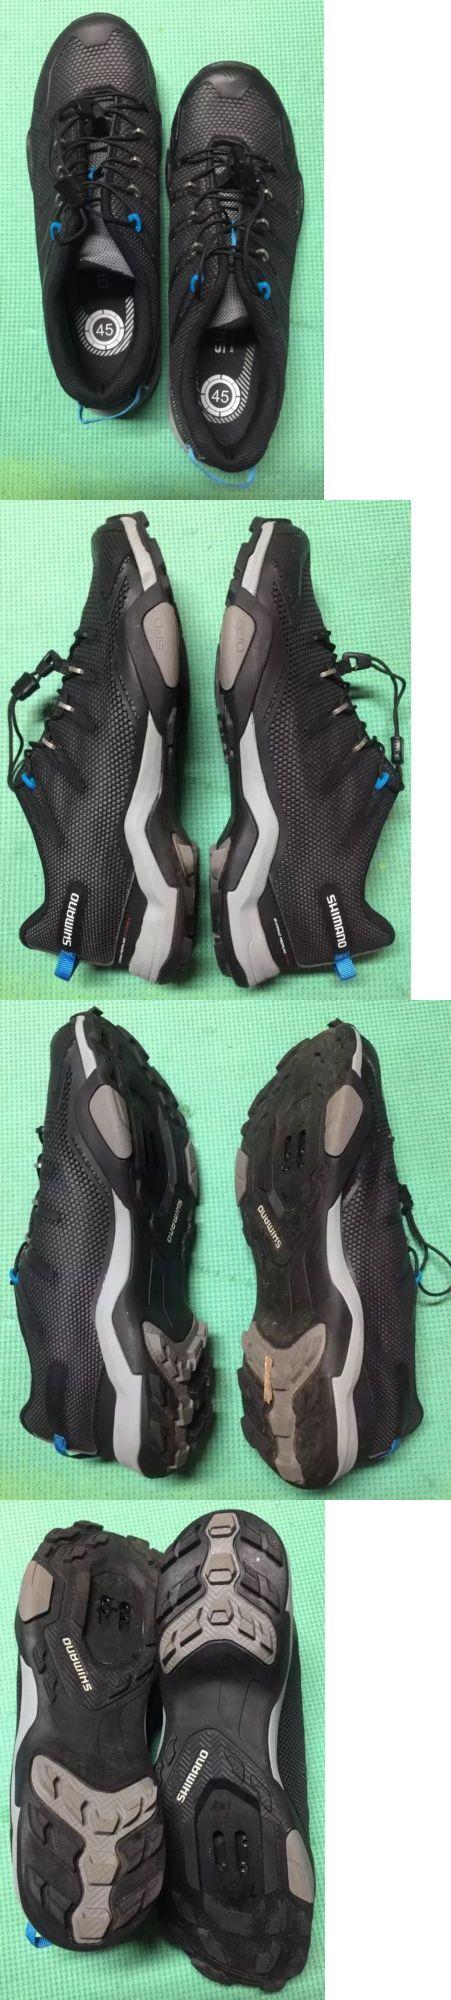 Men 158986: New Shimano Sh-Mt44l Mountain Bike Cycling Shoes 2-Bolt Nylon Size 45Eu 10.5Us -> BUY IT NOW ONLY: $69.99 on eBay!